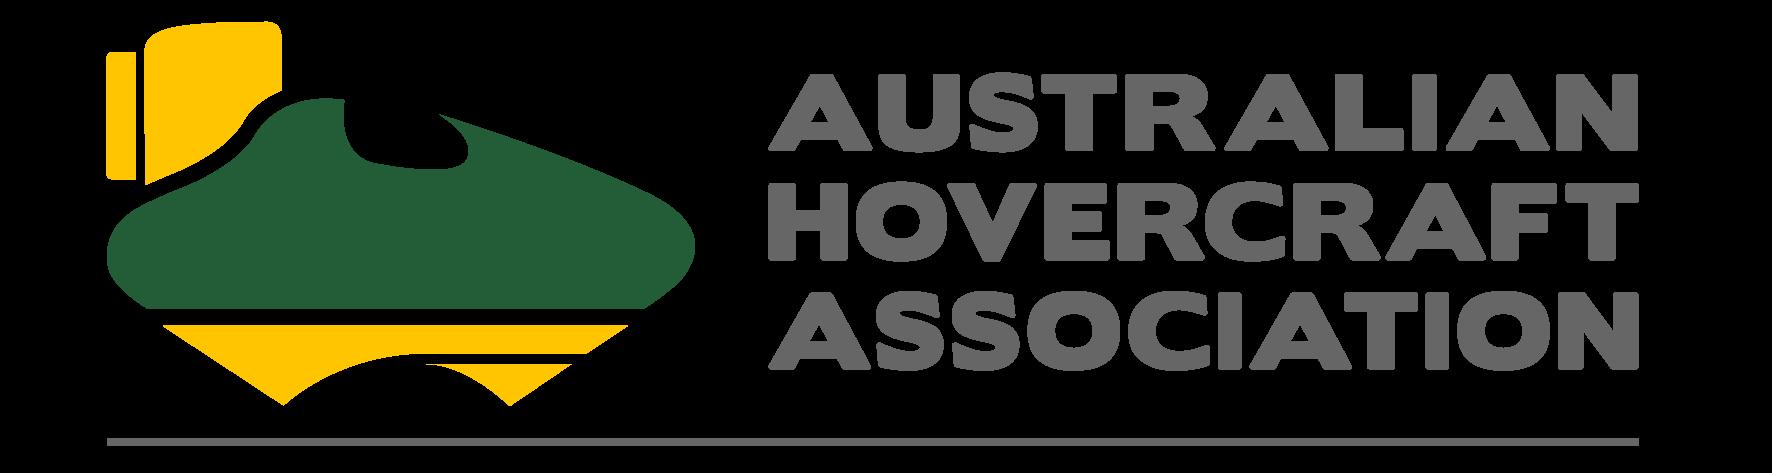 Australian Hovercraft Association Inc.